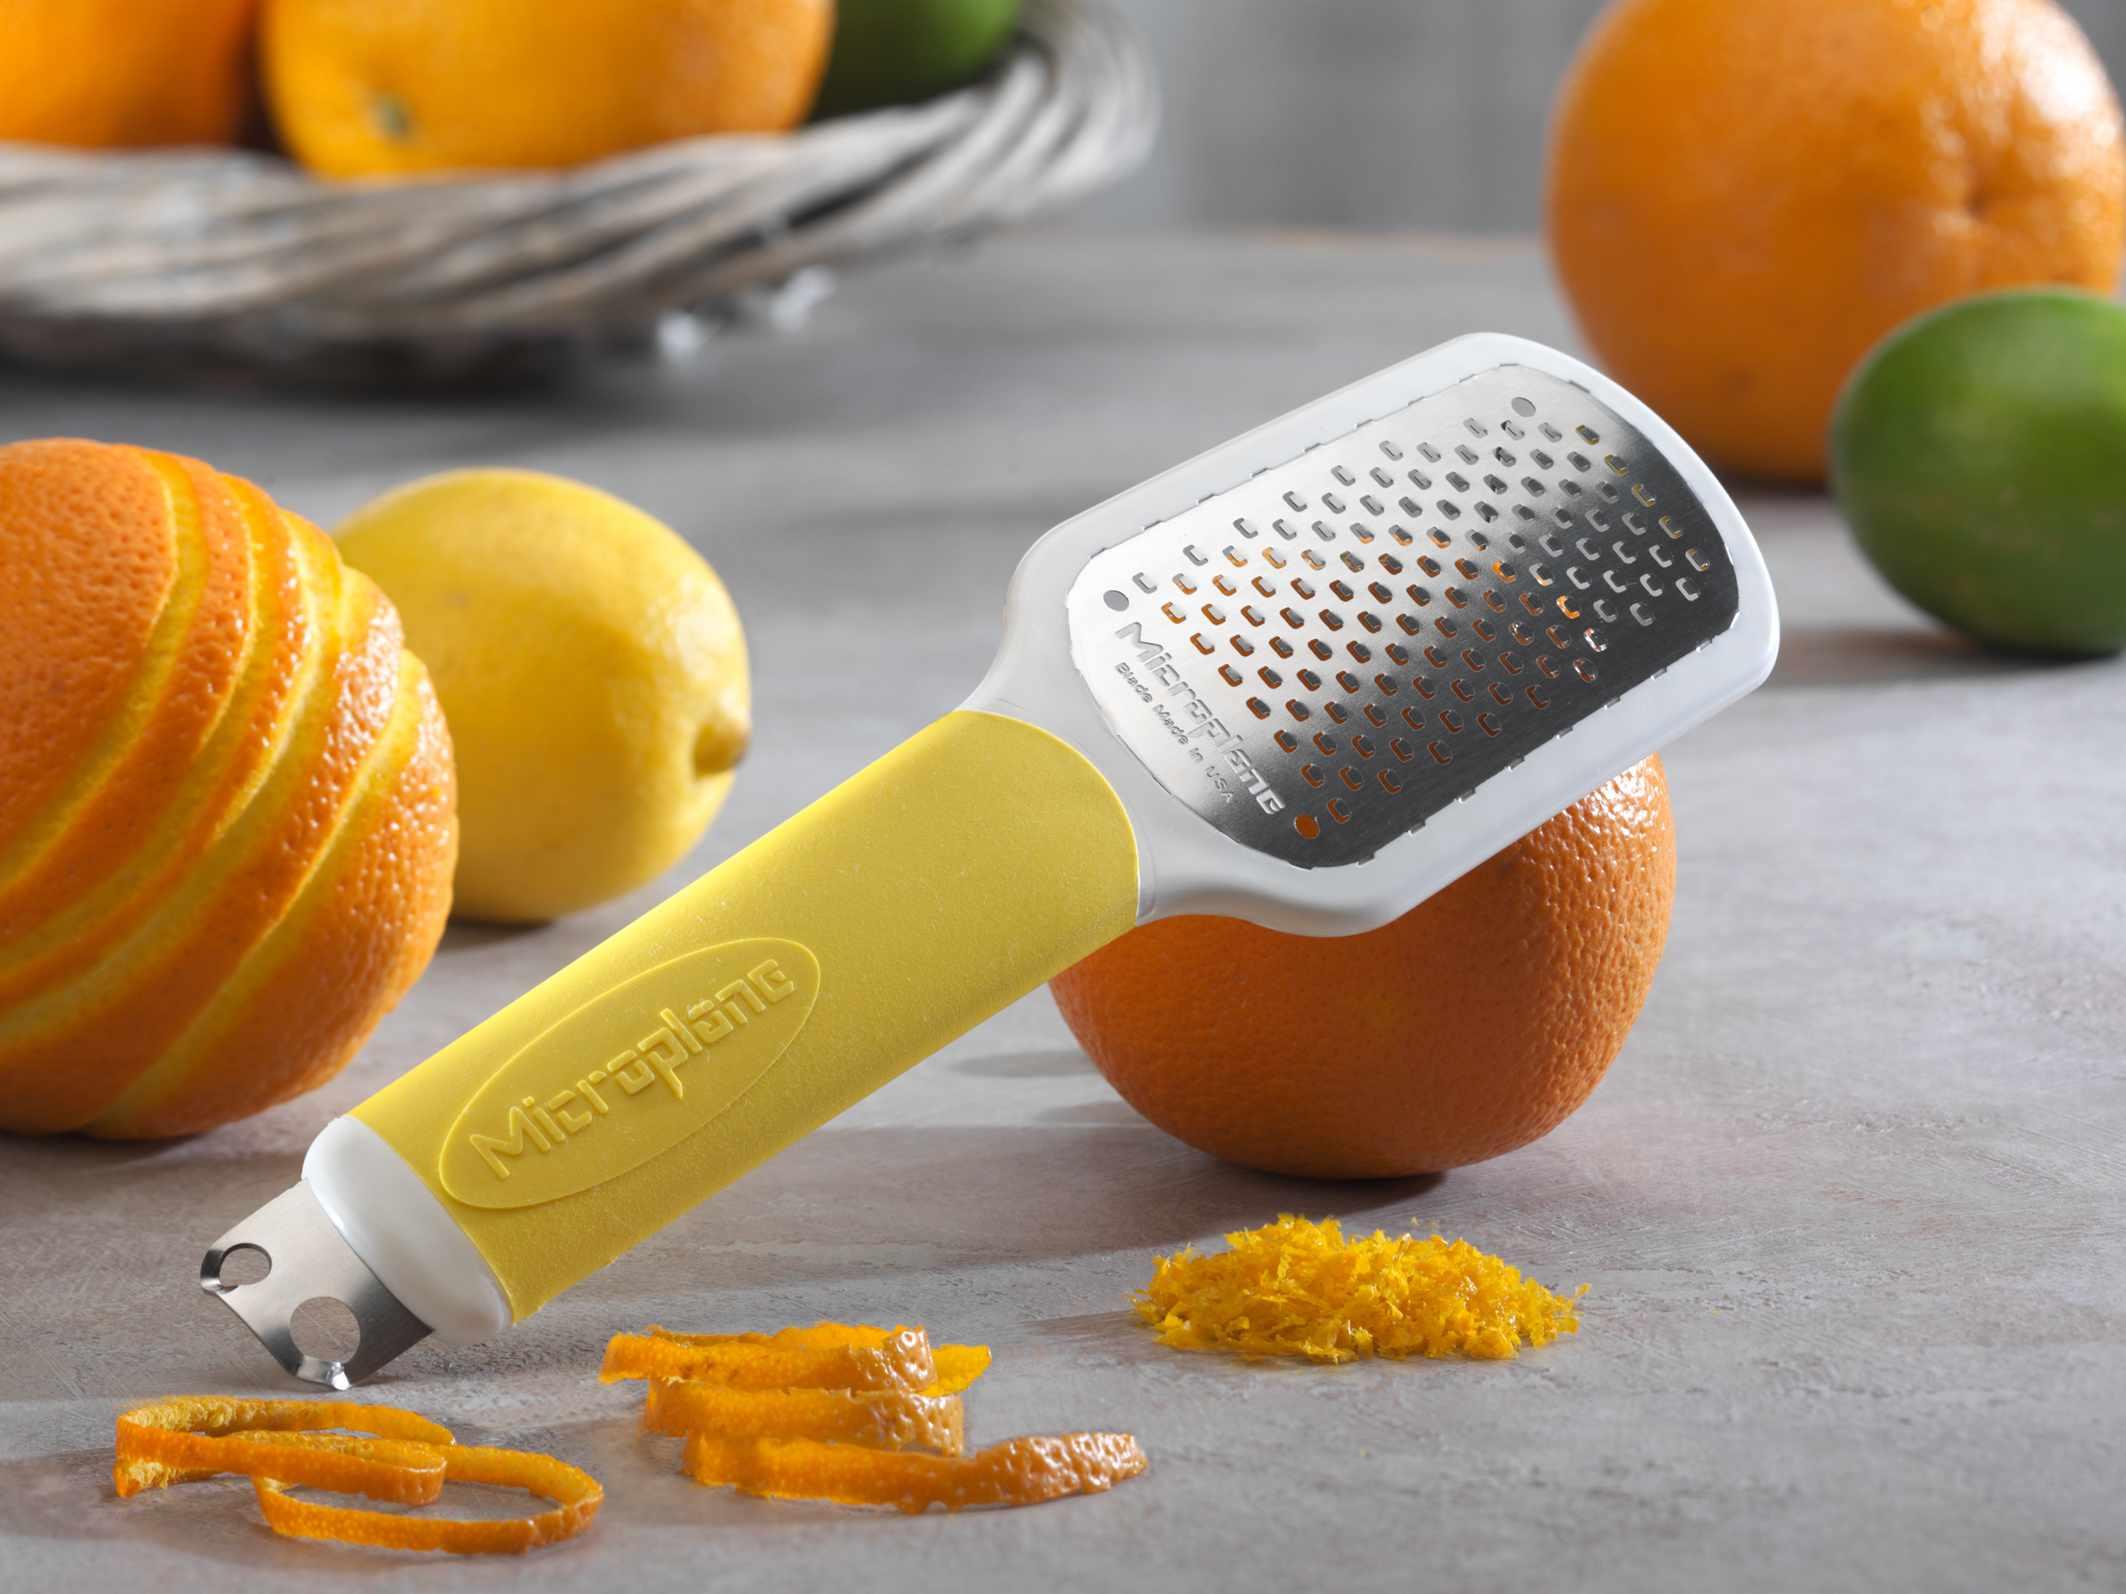 Microplane citrus tool